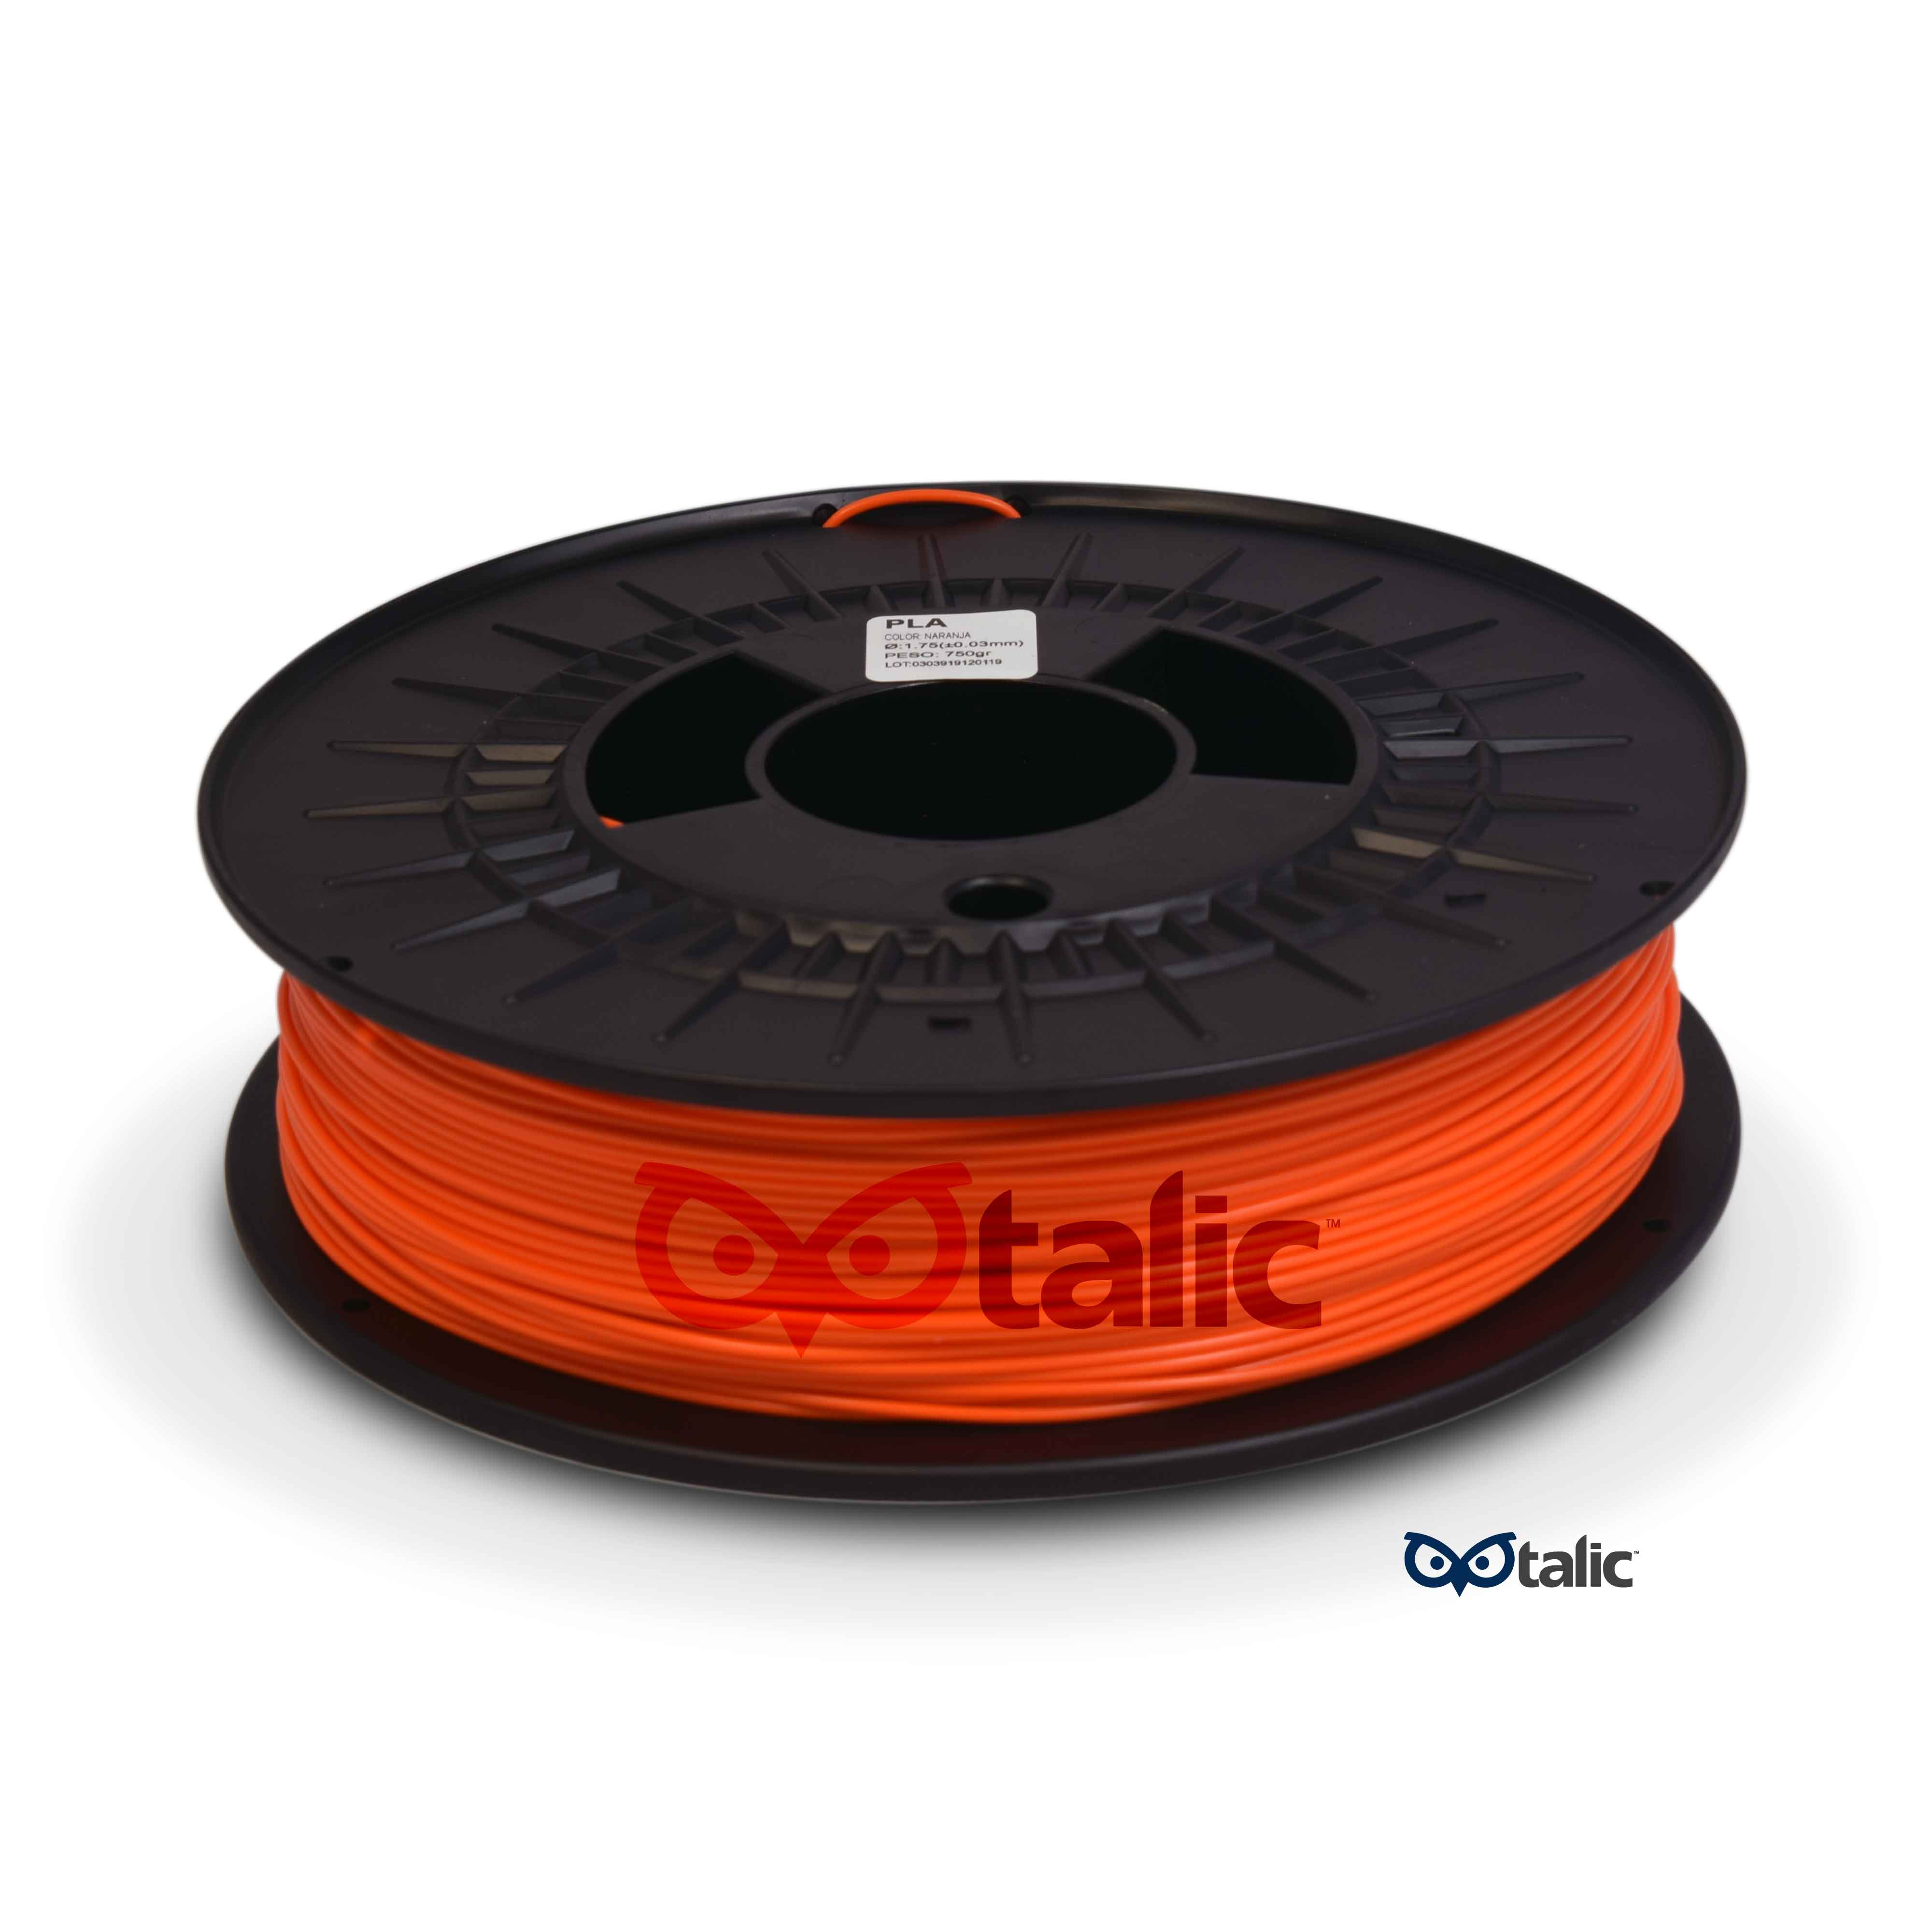 filamento dgtalic, filamento de 1.75, filamento de 2.85, filamento de 1,75, filamento de 2,85, filamento pla, pla, pla premium, pla plus, dgtalic, monofilamento, filament, dgtalic filament, pla filament